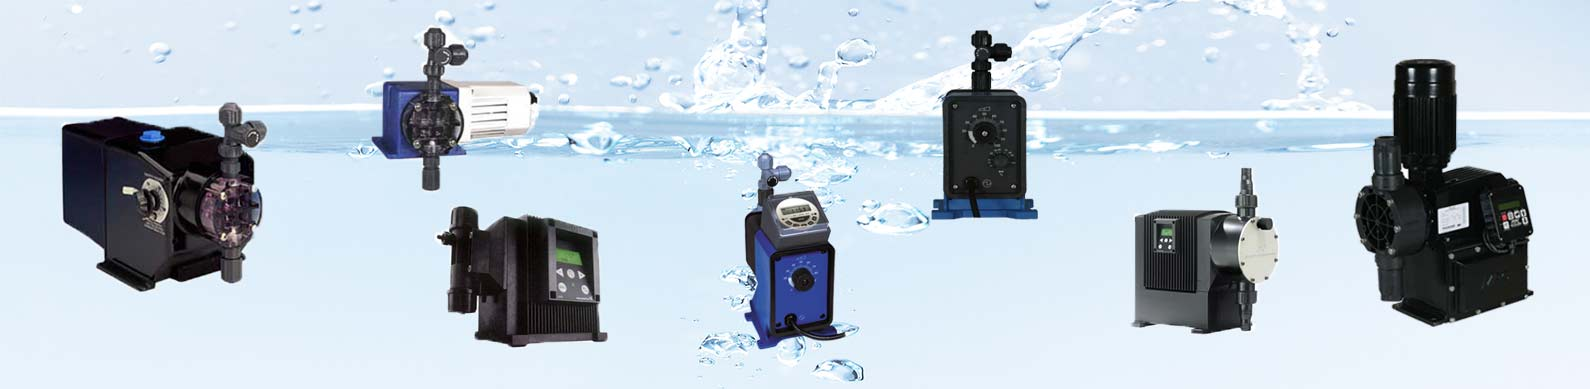 chemical-dosing-pumps-parts.jpg